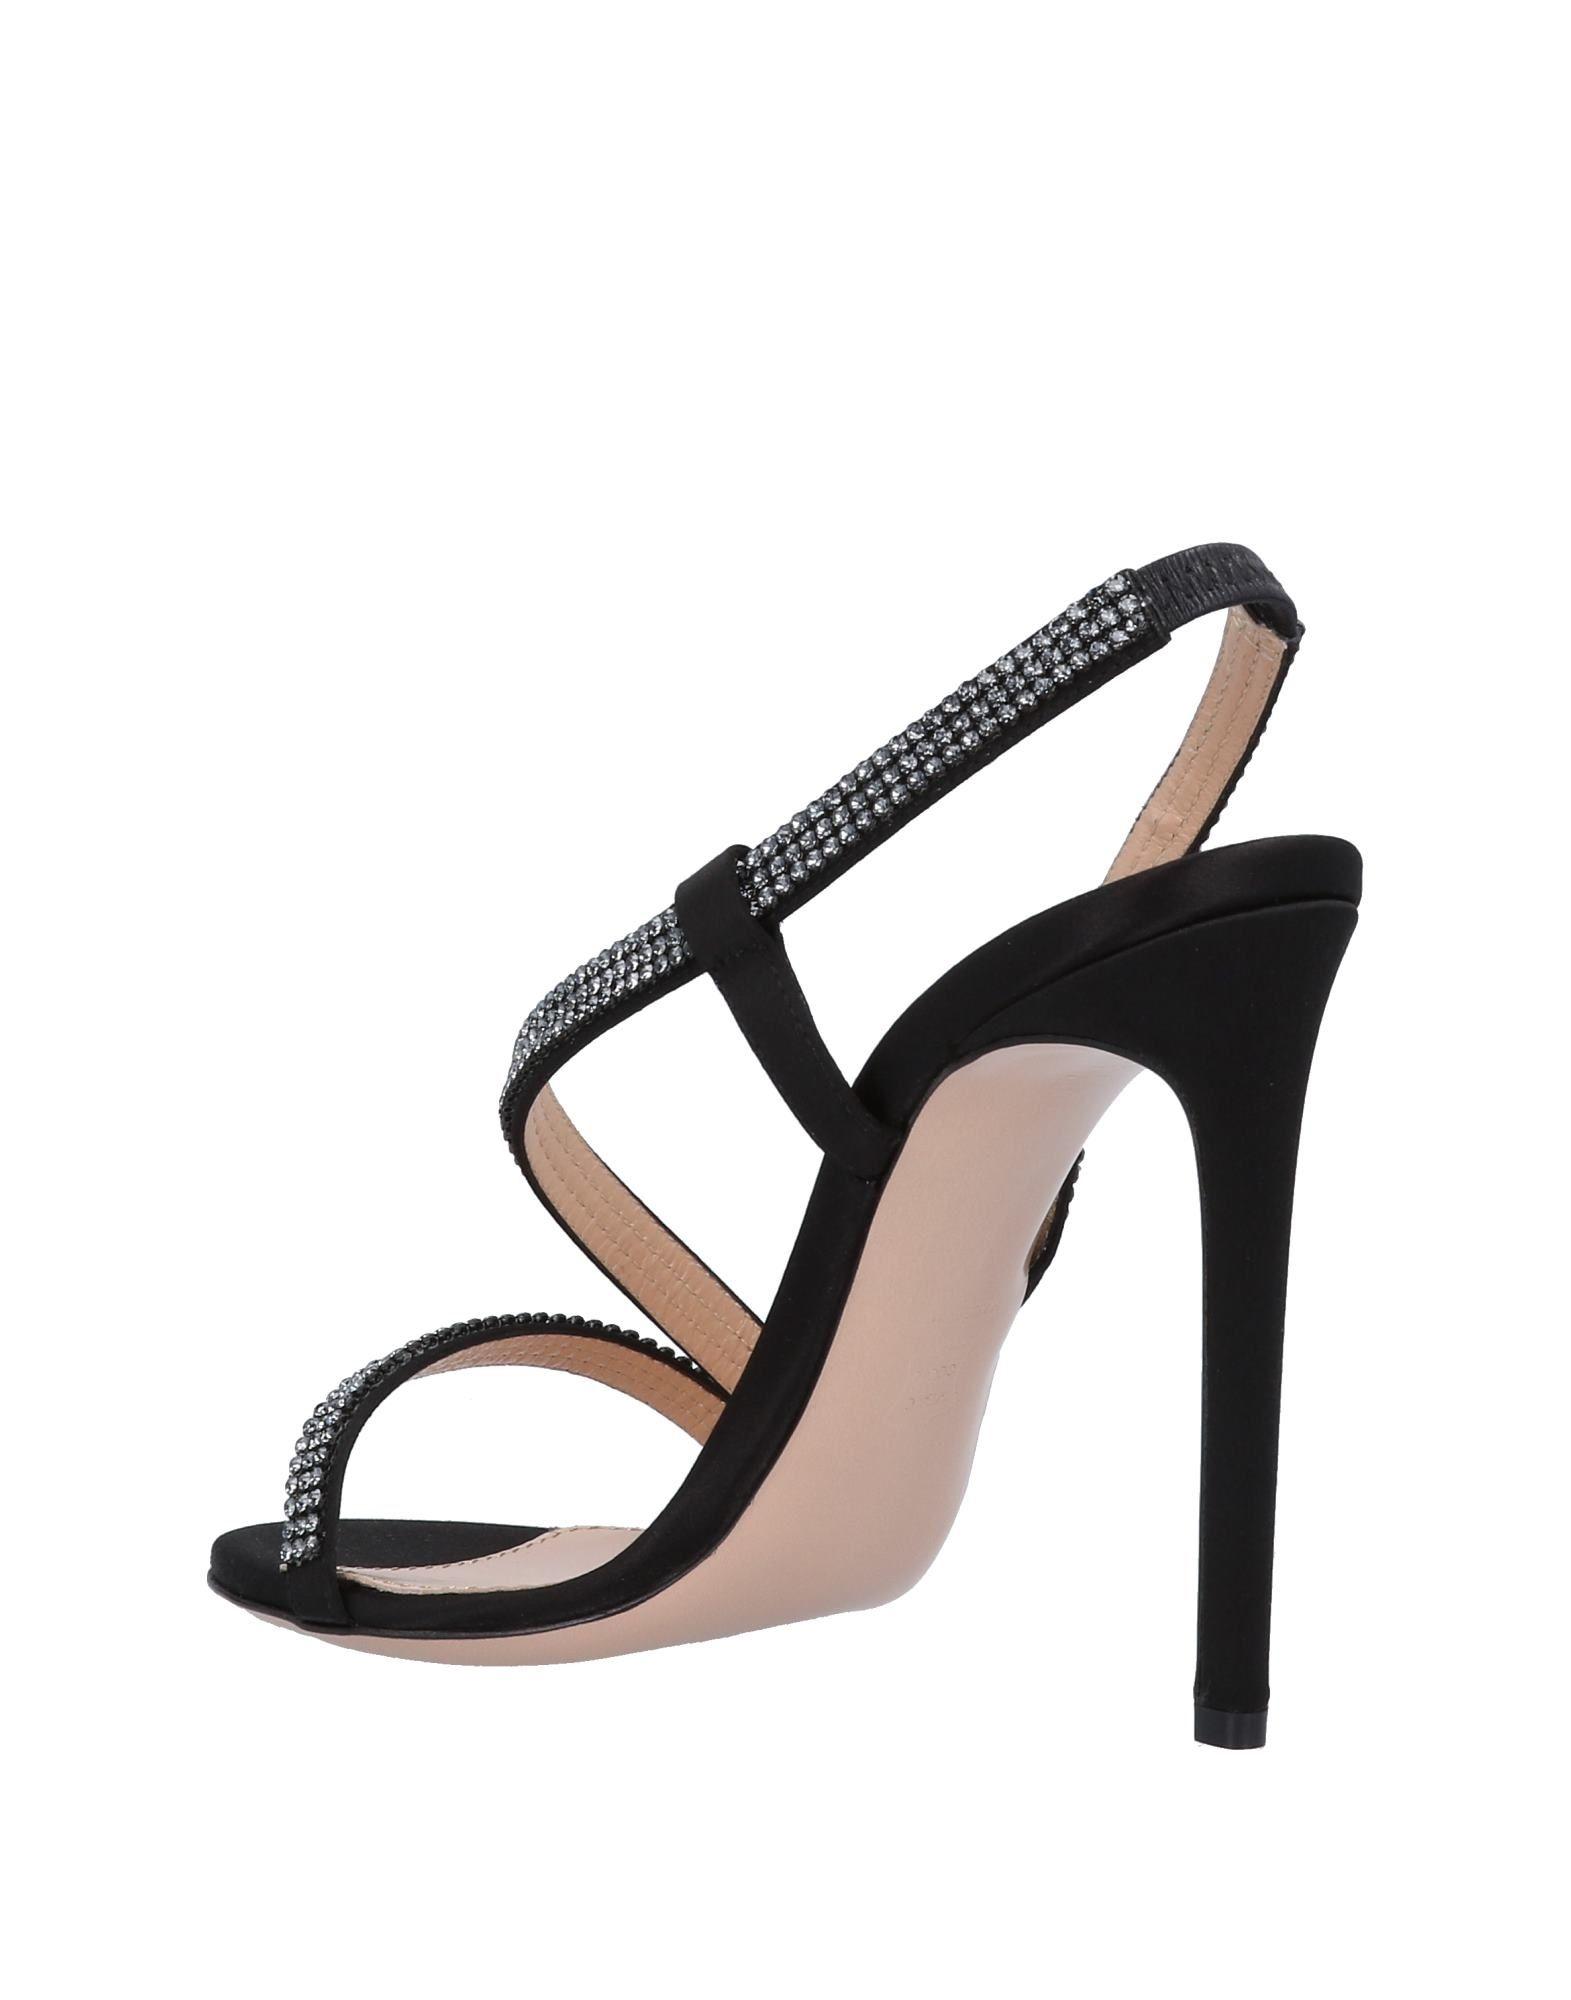 Sandali - Lerre Donna - Sandali 11498225QU elegante 0da241